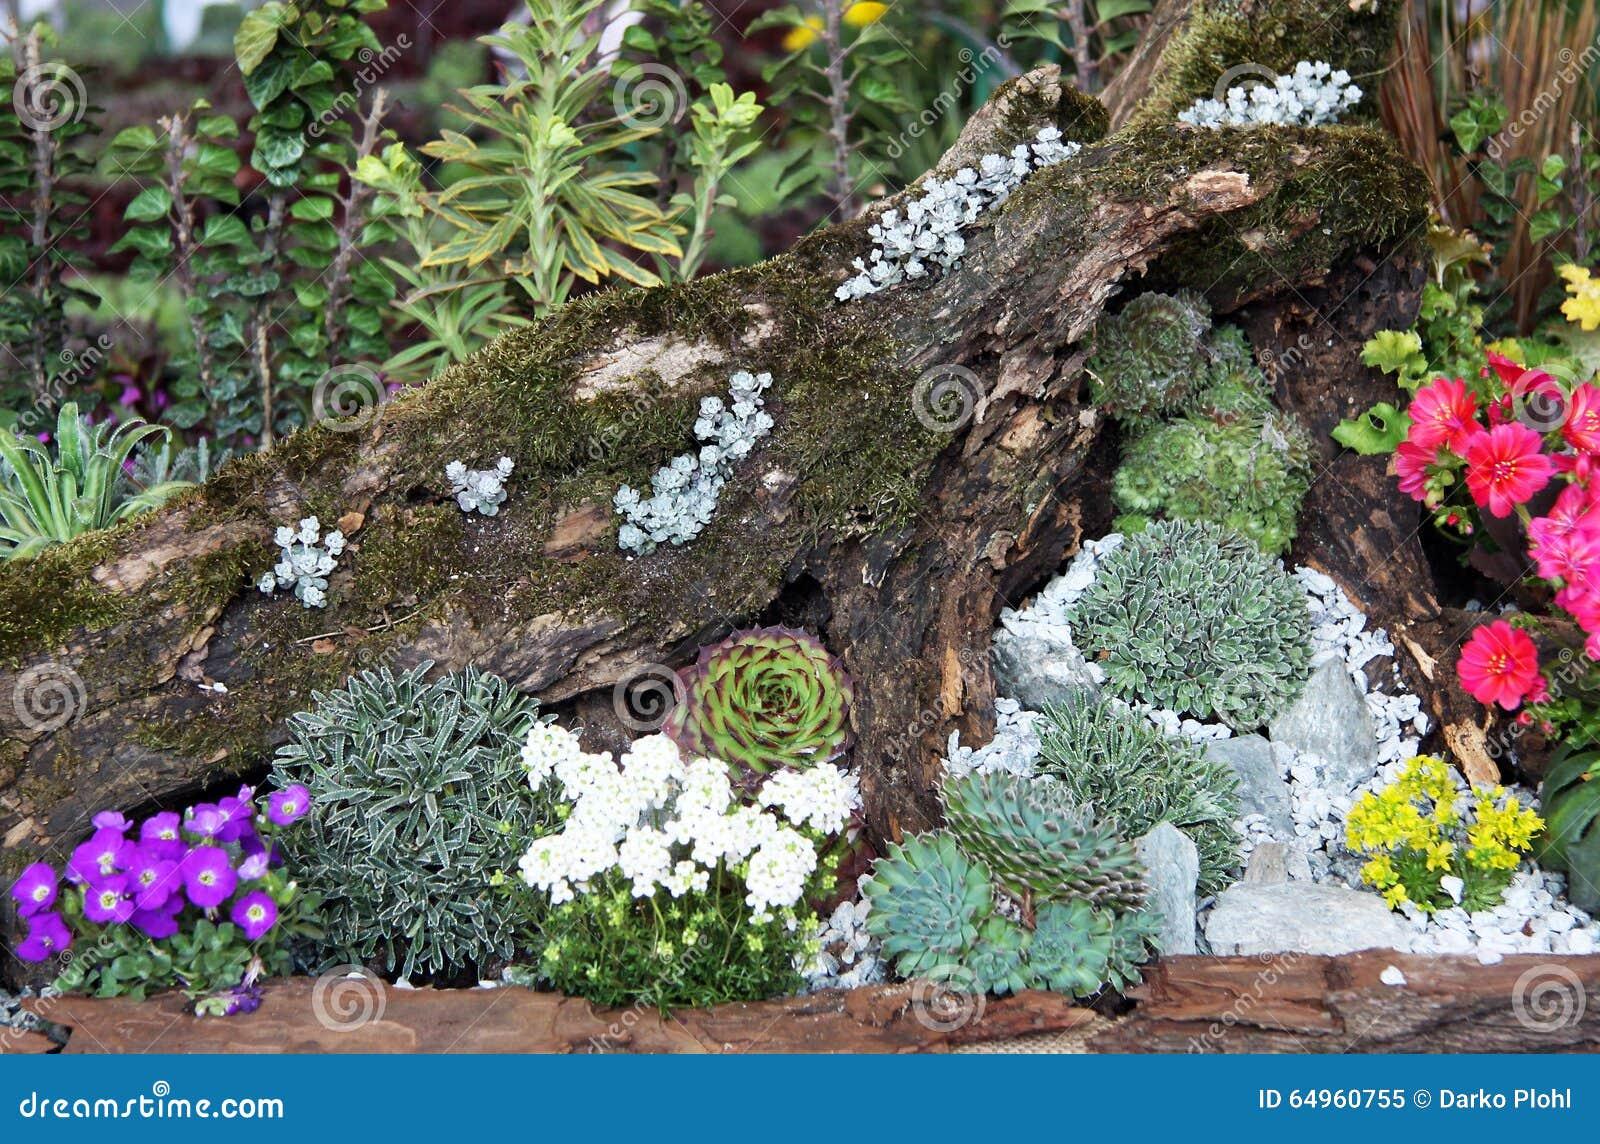 fabulous modeles de rocailles jardin rocaille jardin amenagement terrasse mini jardin de cactus avec amnagement jardin en pente douce with rocaille jardin